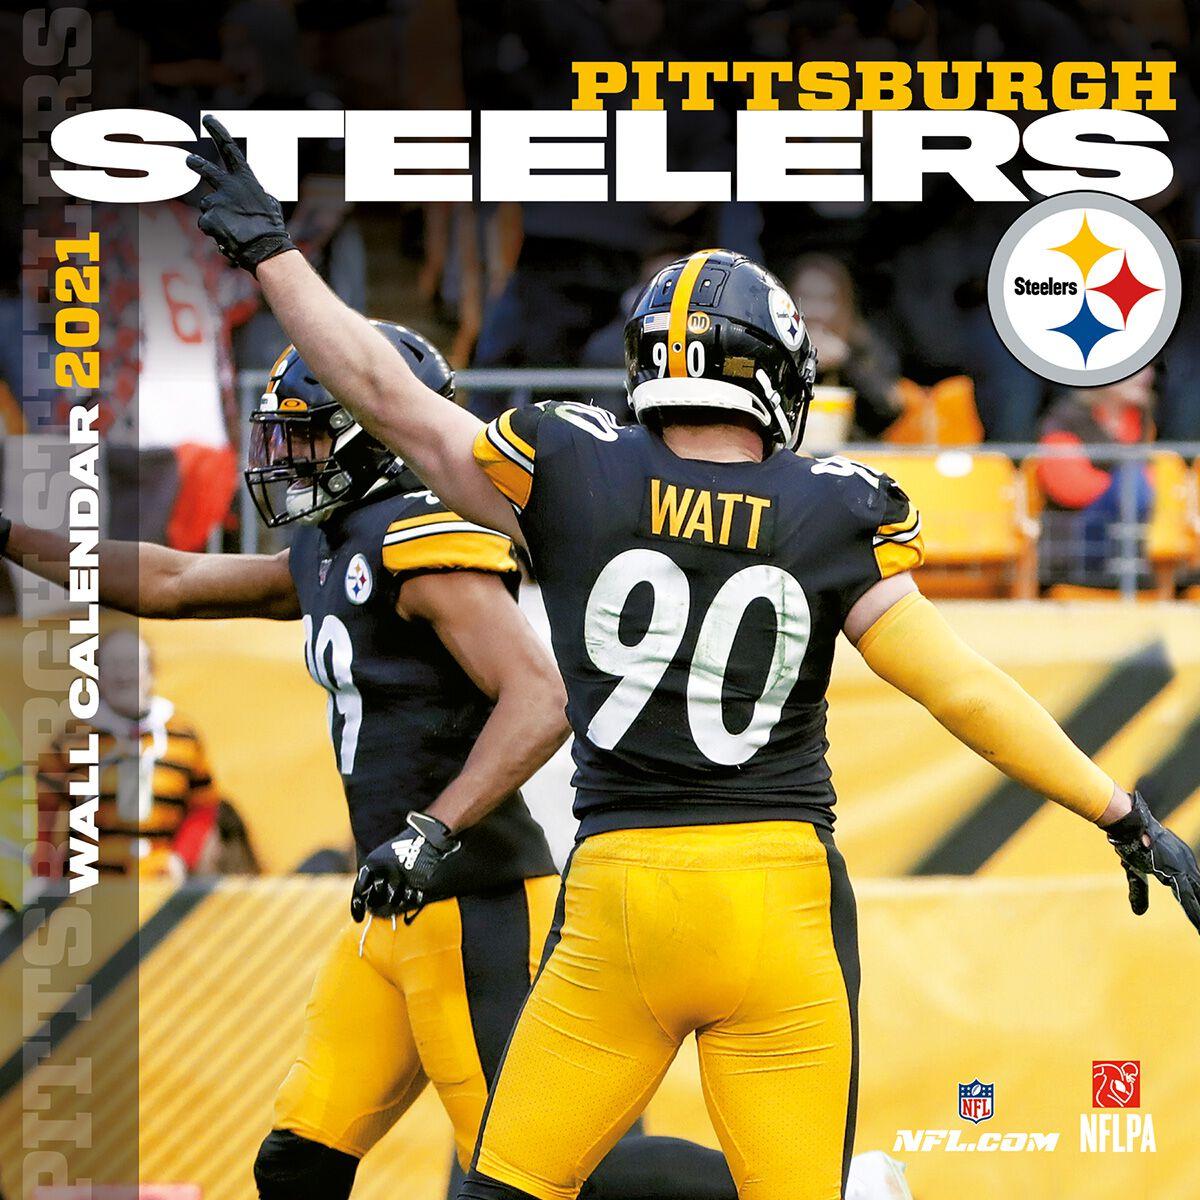 Pittsburgh Steelers   Calendrier 2021 | NFL Calendrier mural | EMP